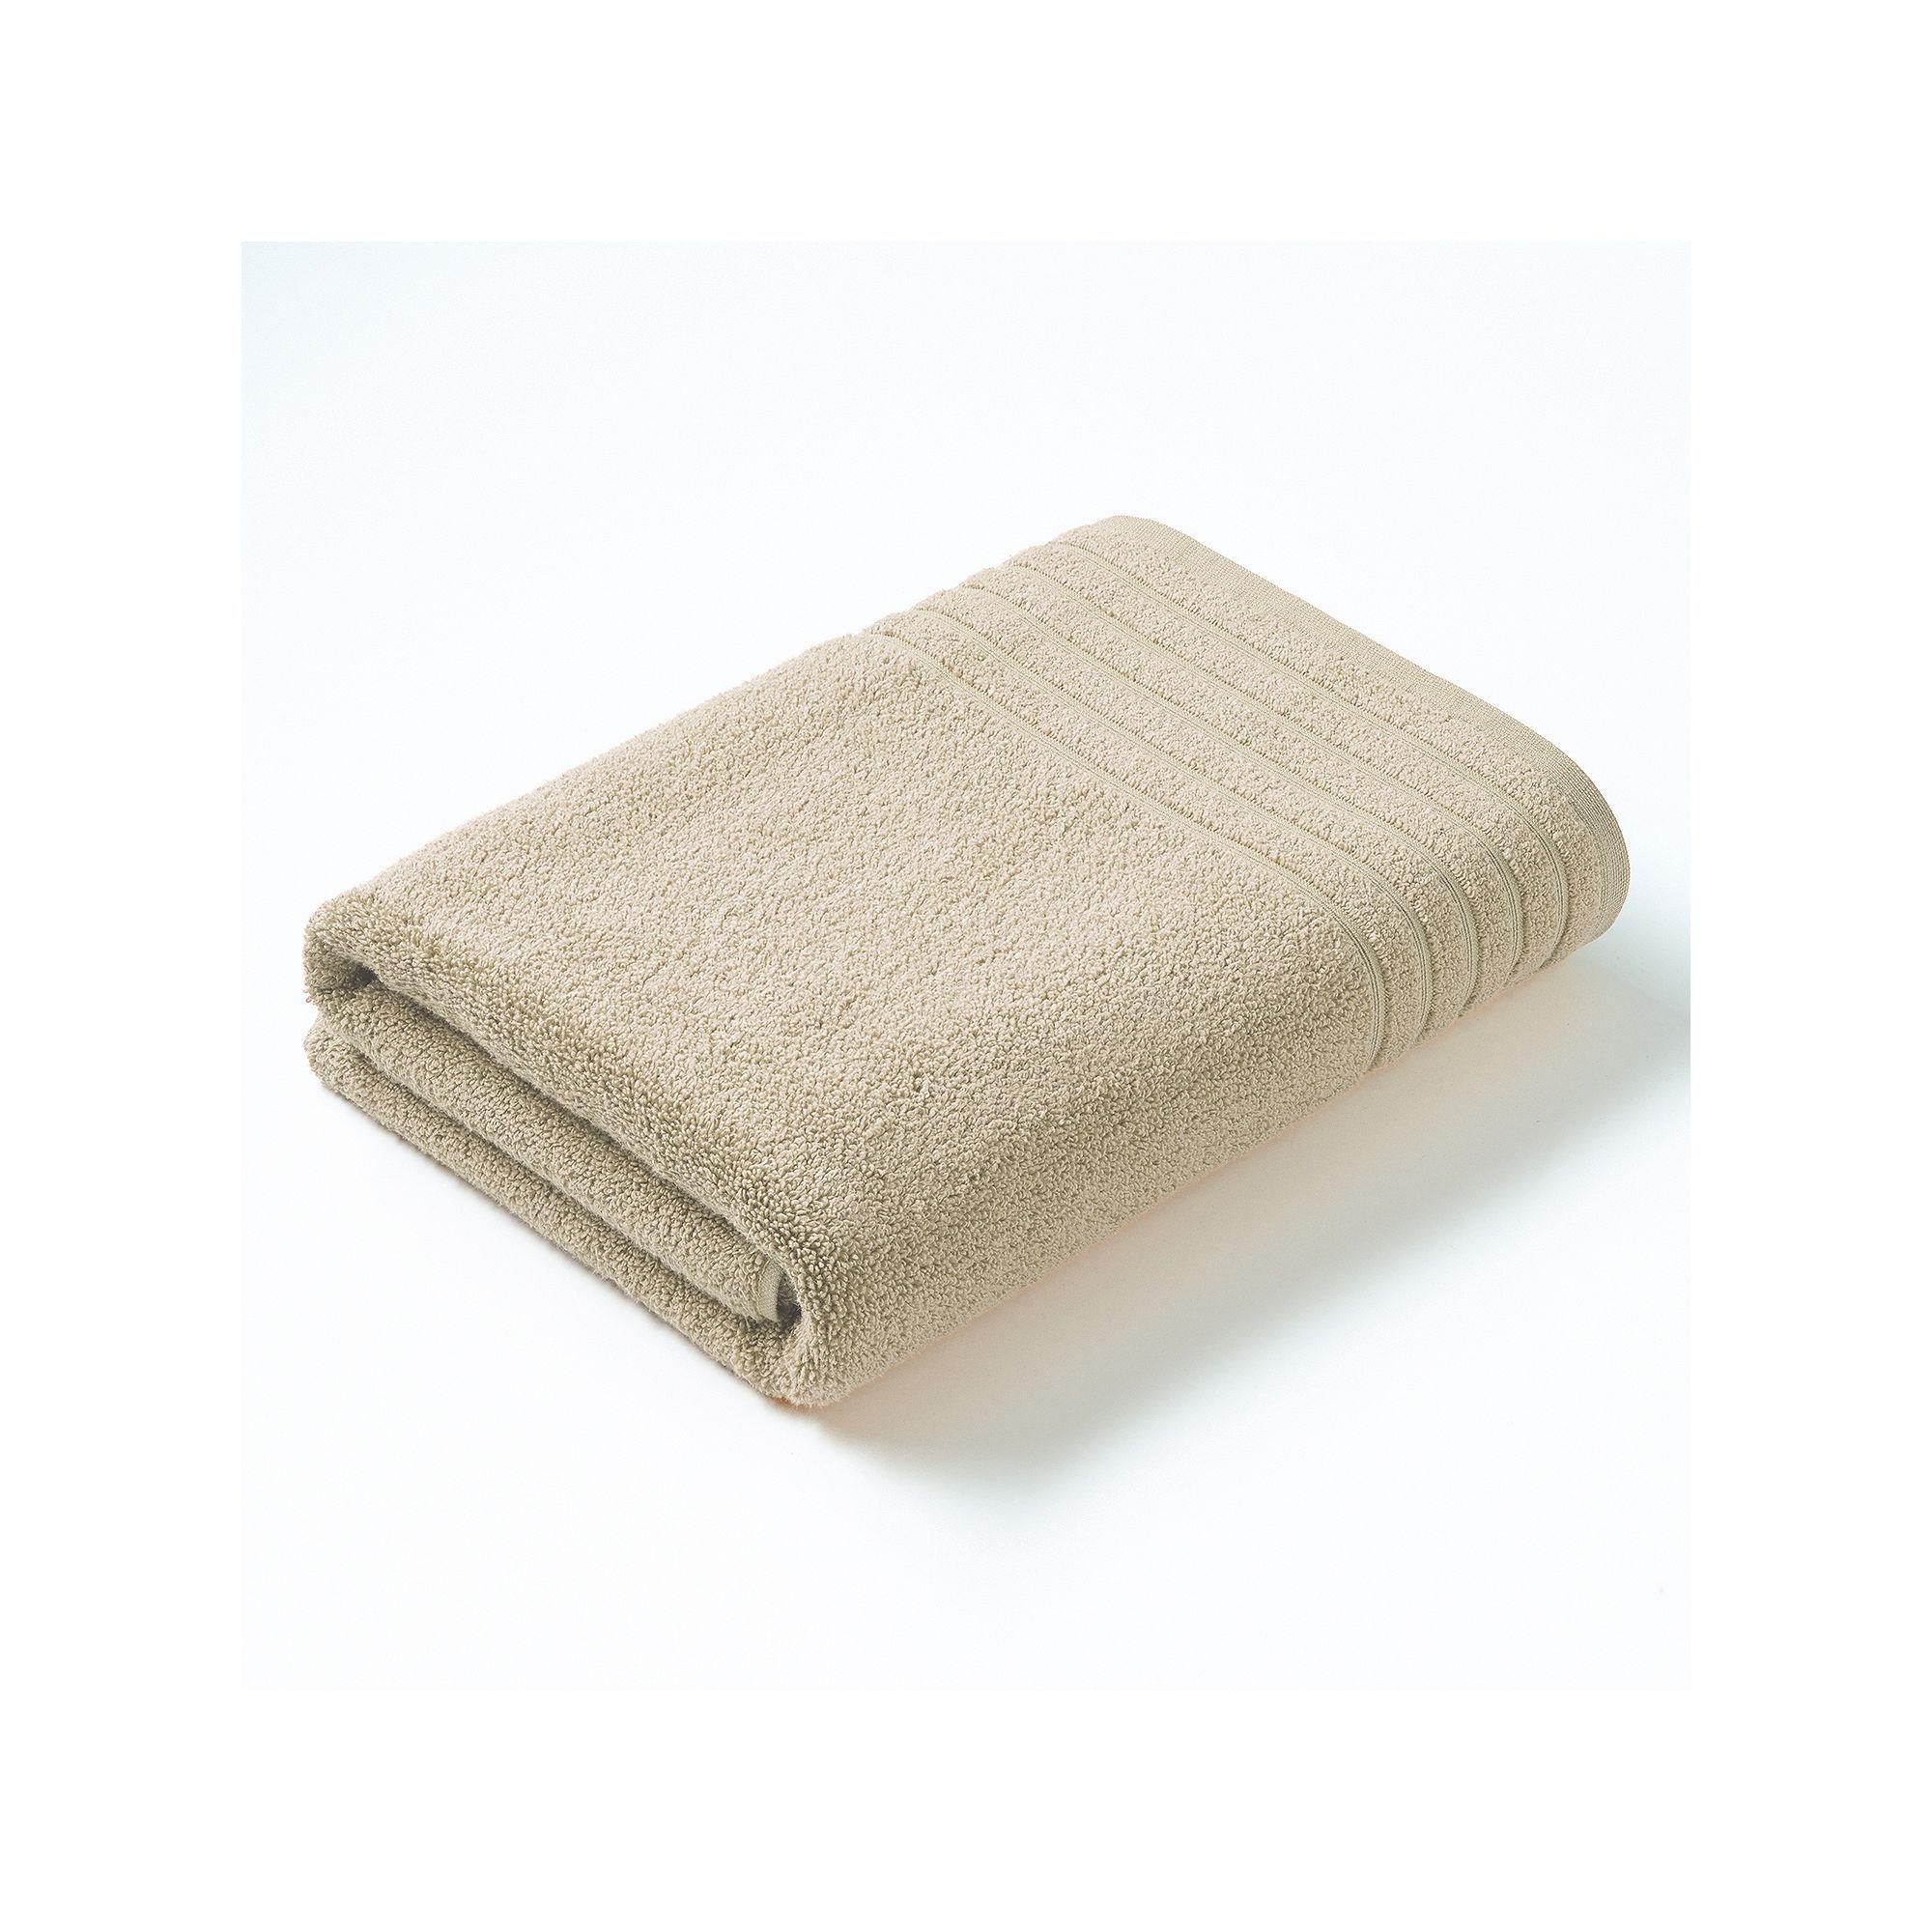 Simply Vera Vera Wang Pure Luxury Bath Towel Products Pure